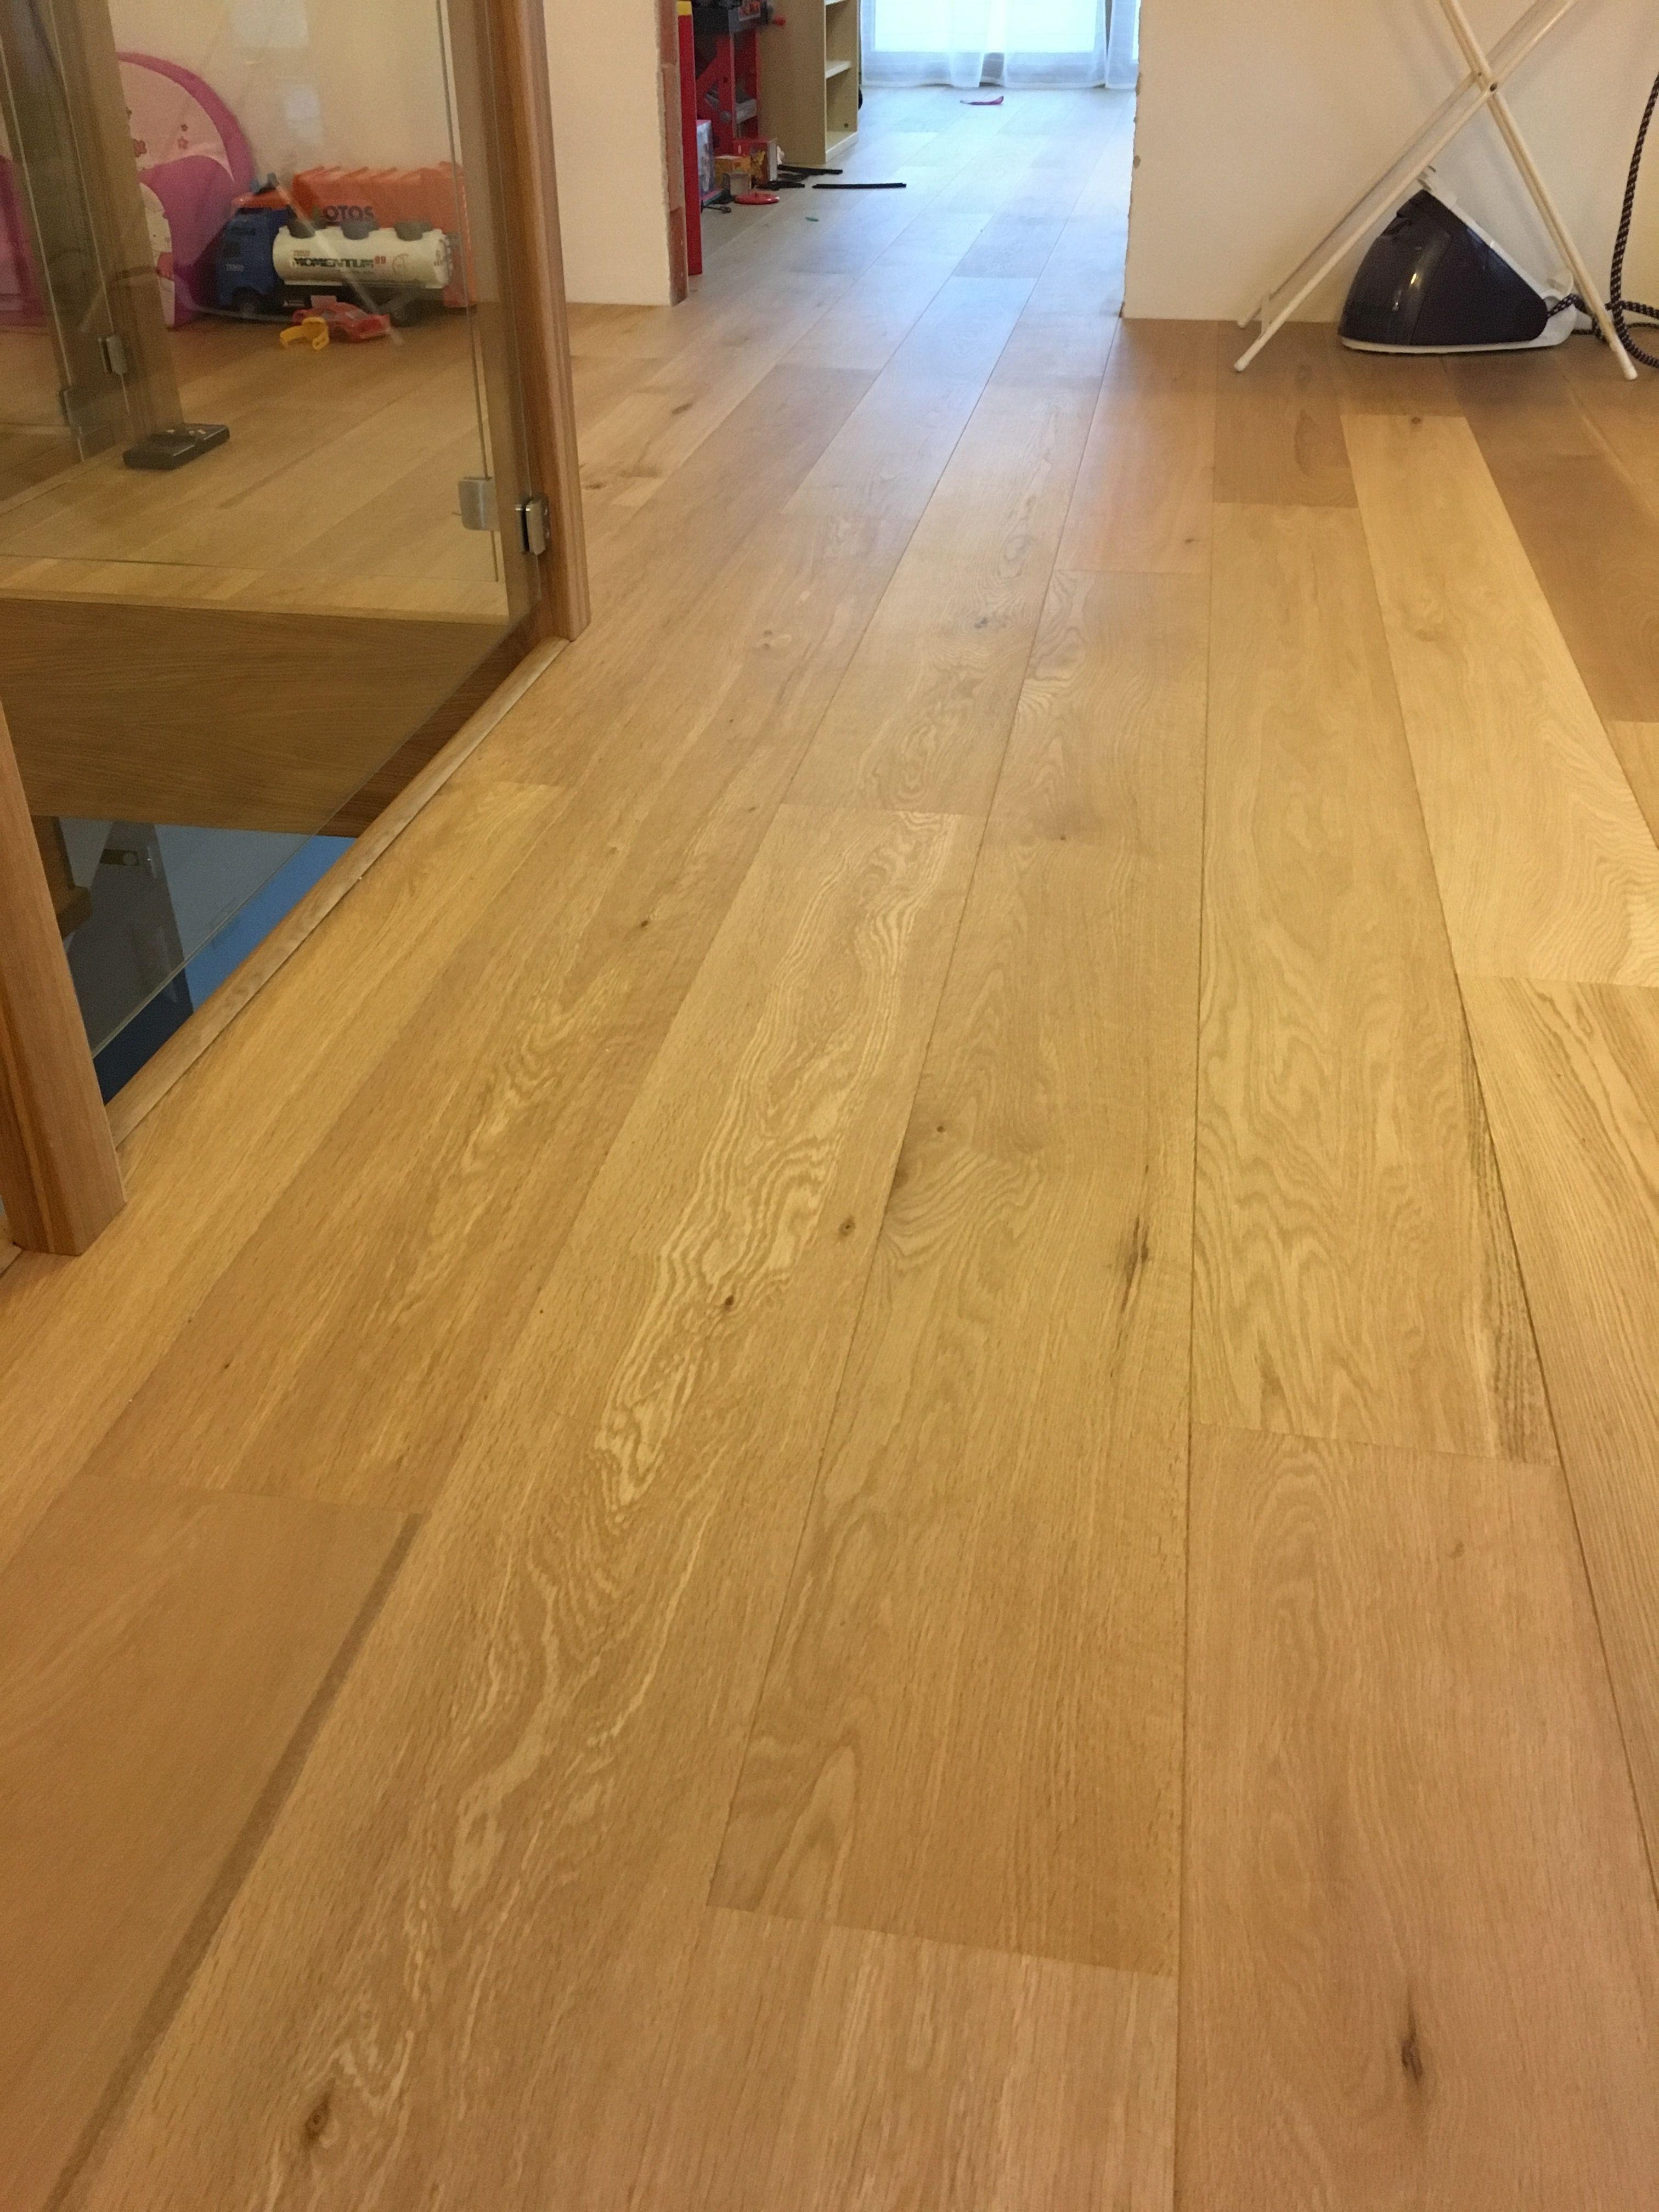 1 hardwood flooring of laminate flooring patterns beautiful chaise vintage metal 1 kirkland throughout 40 can you stain laminate flooring inspiration